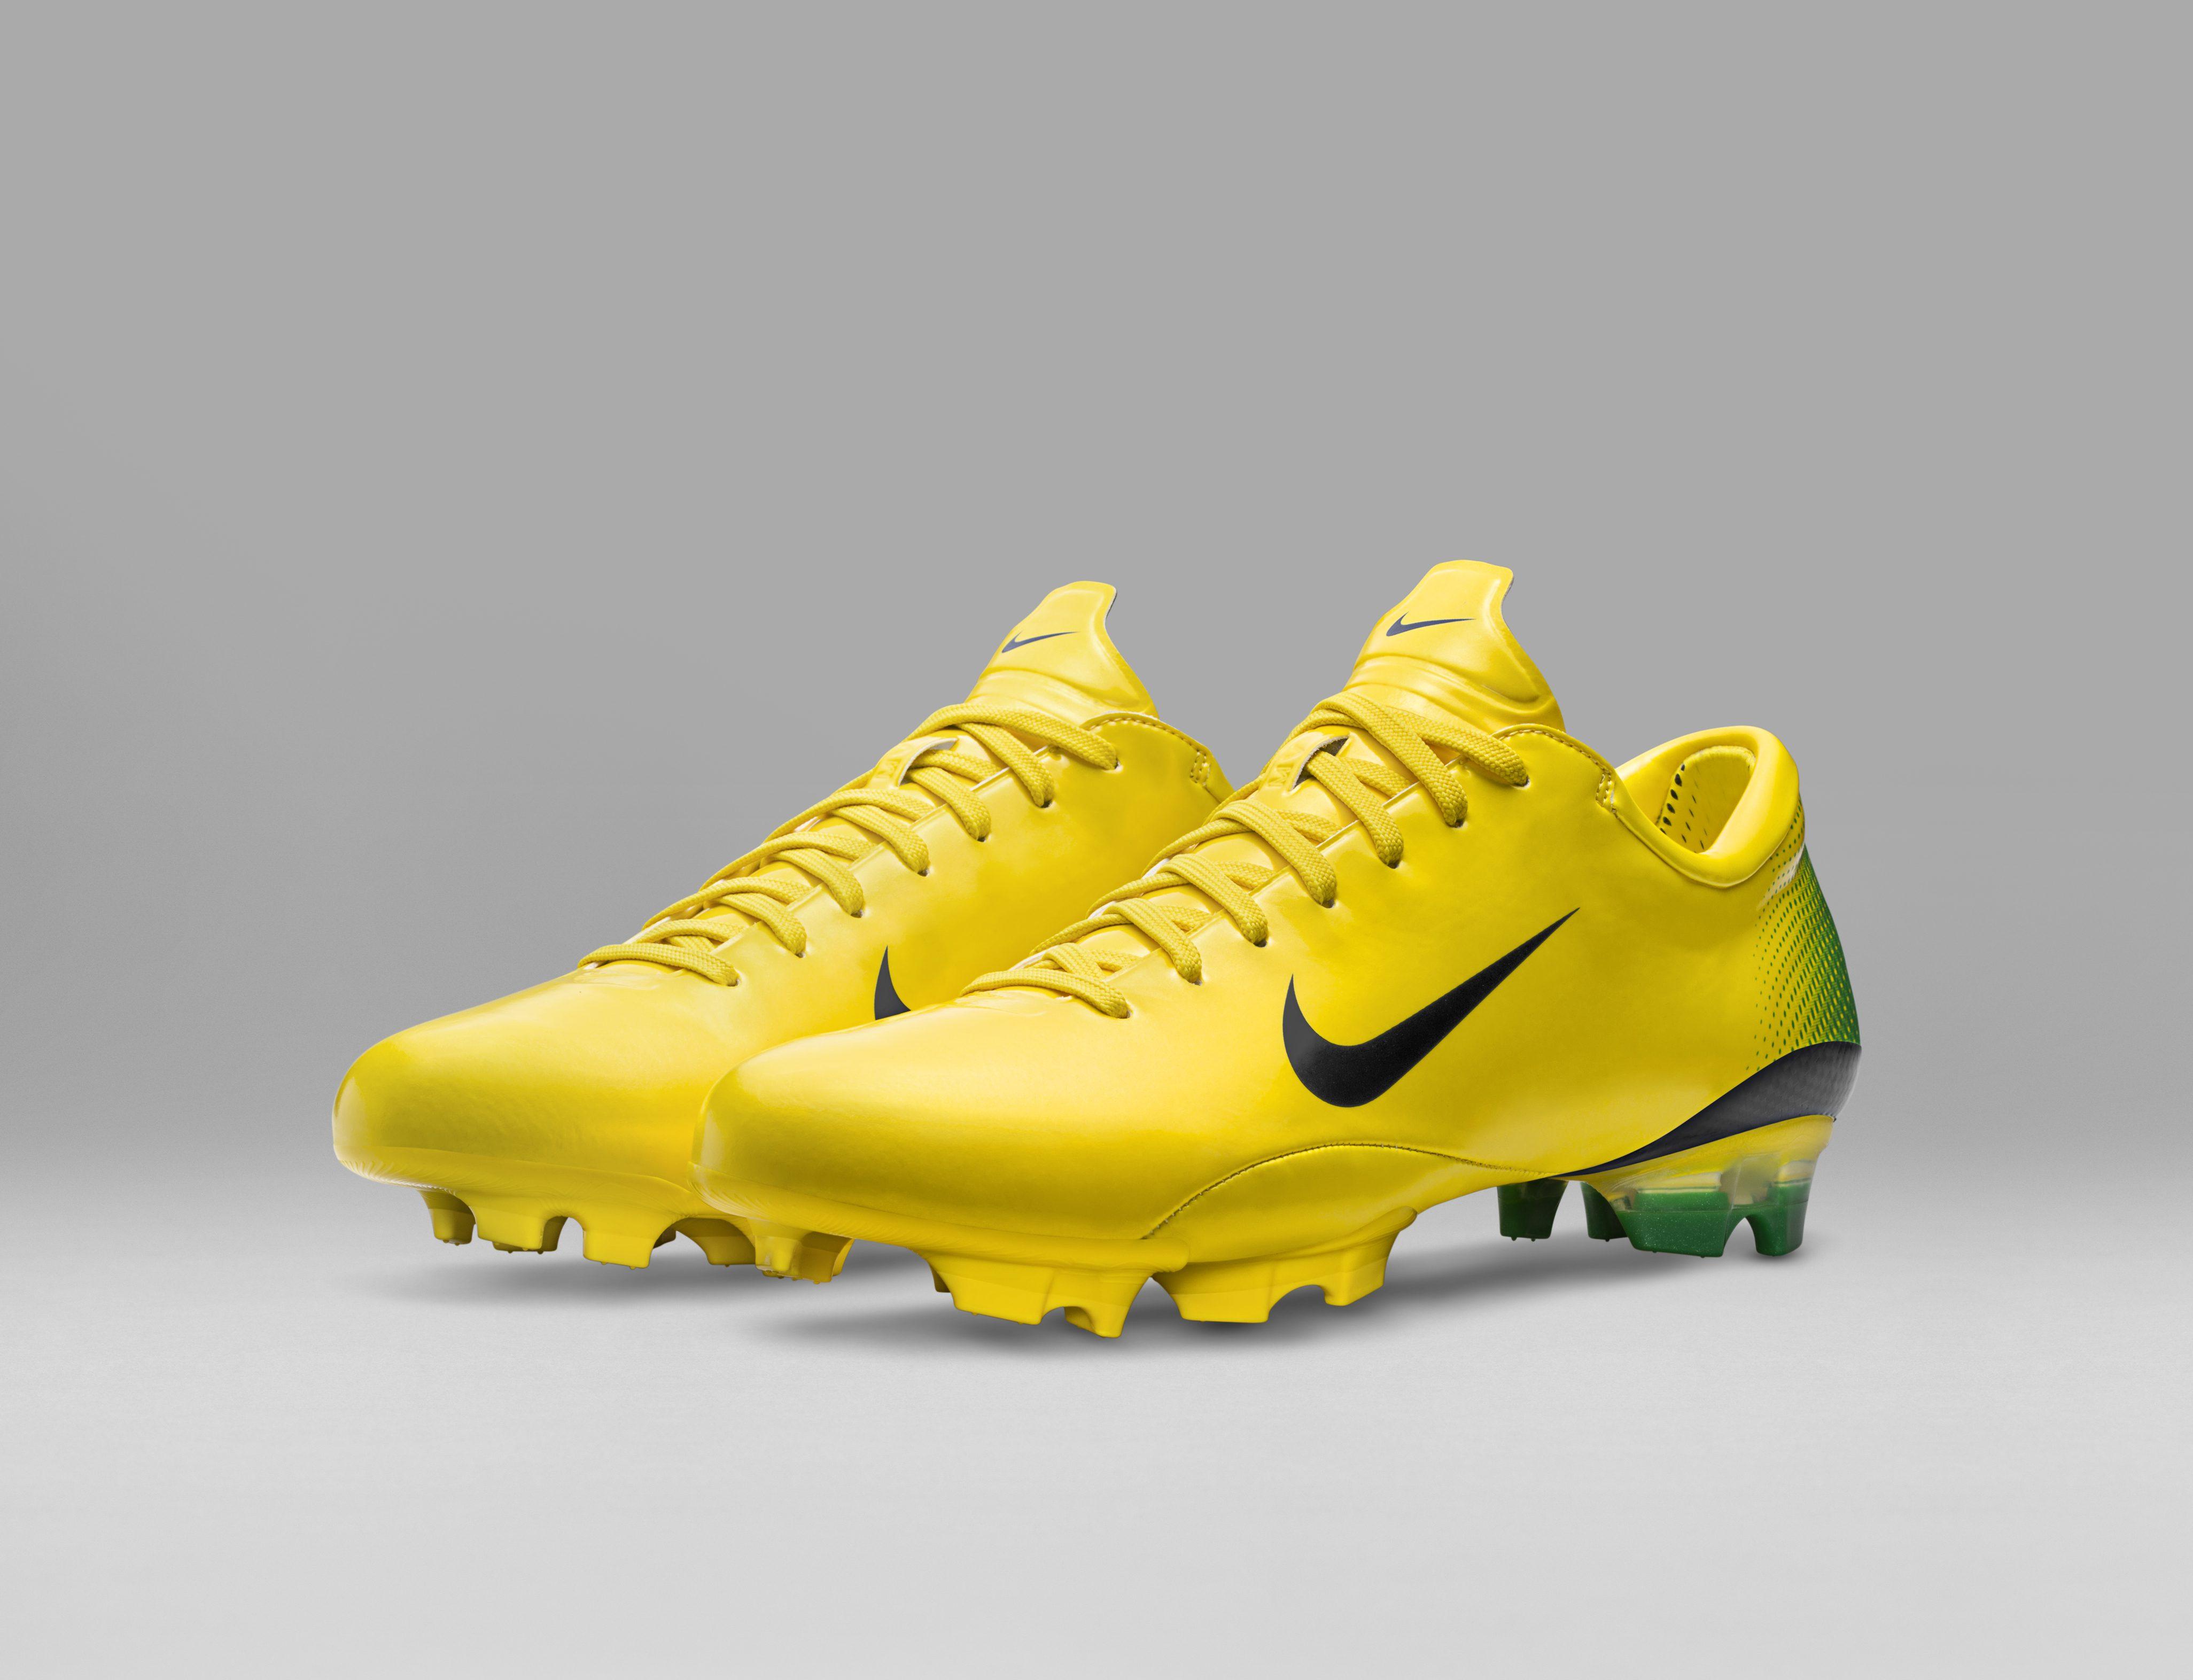 2006_Nike_Mercurial_Vapor_III__55732.jpg